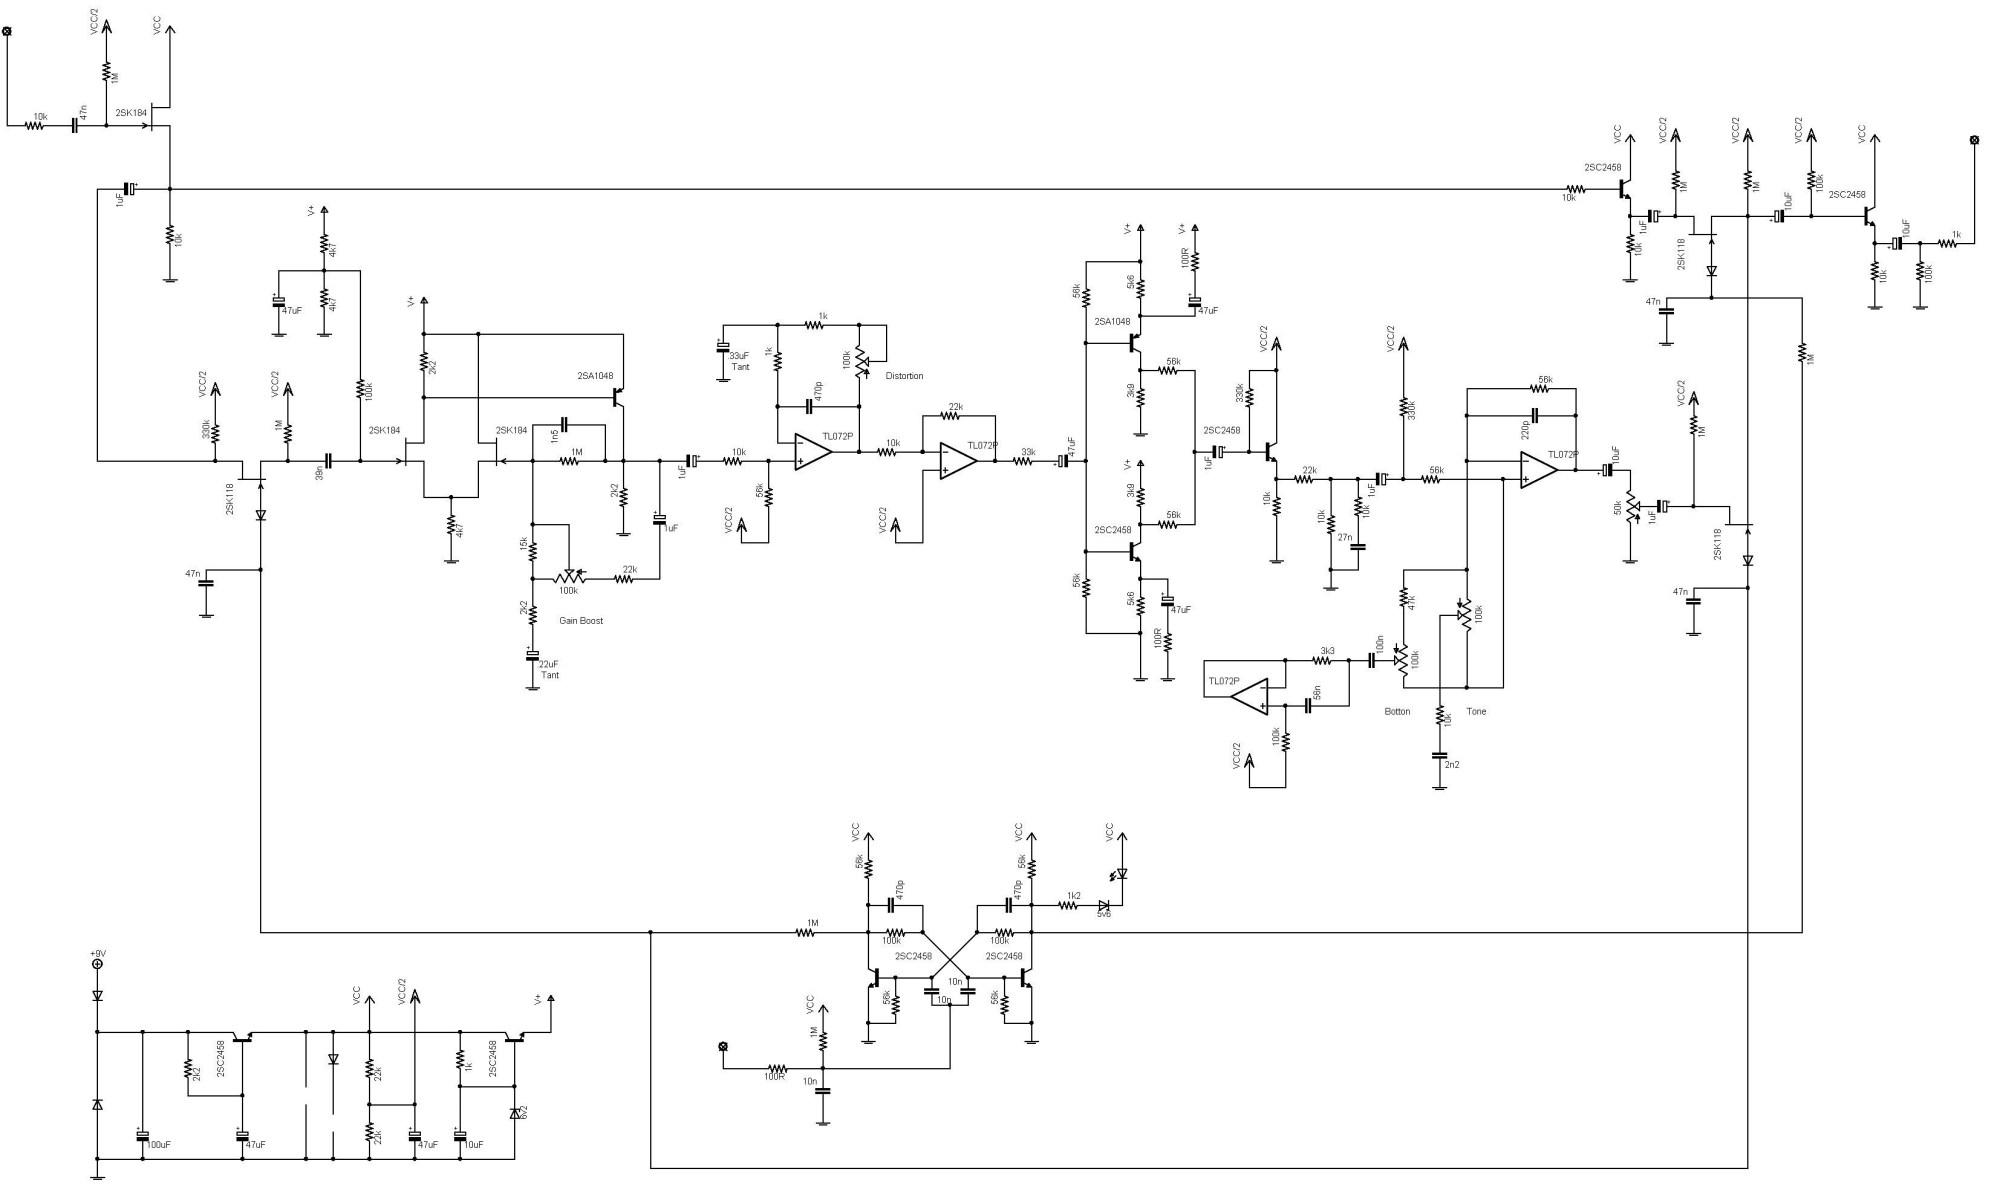 hight resolution of guitar wiring schematics auto diagrams instructions gfs wiring diagram hss auto diagrams instructions danelectroguitarwiringdiagram dano